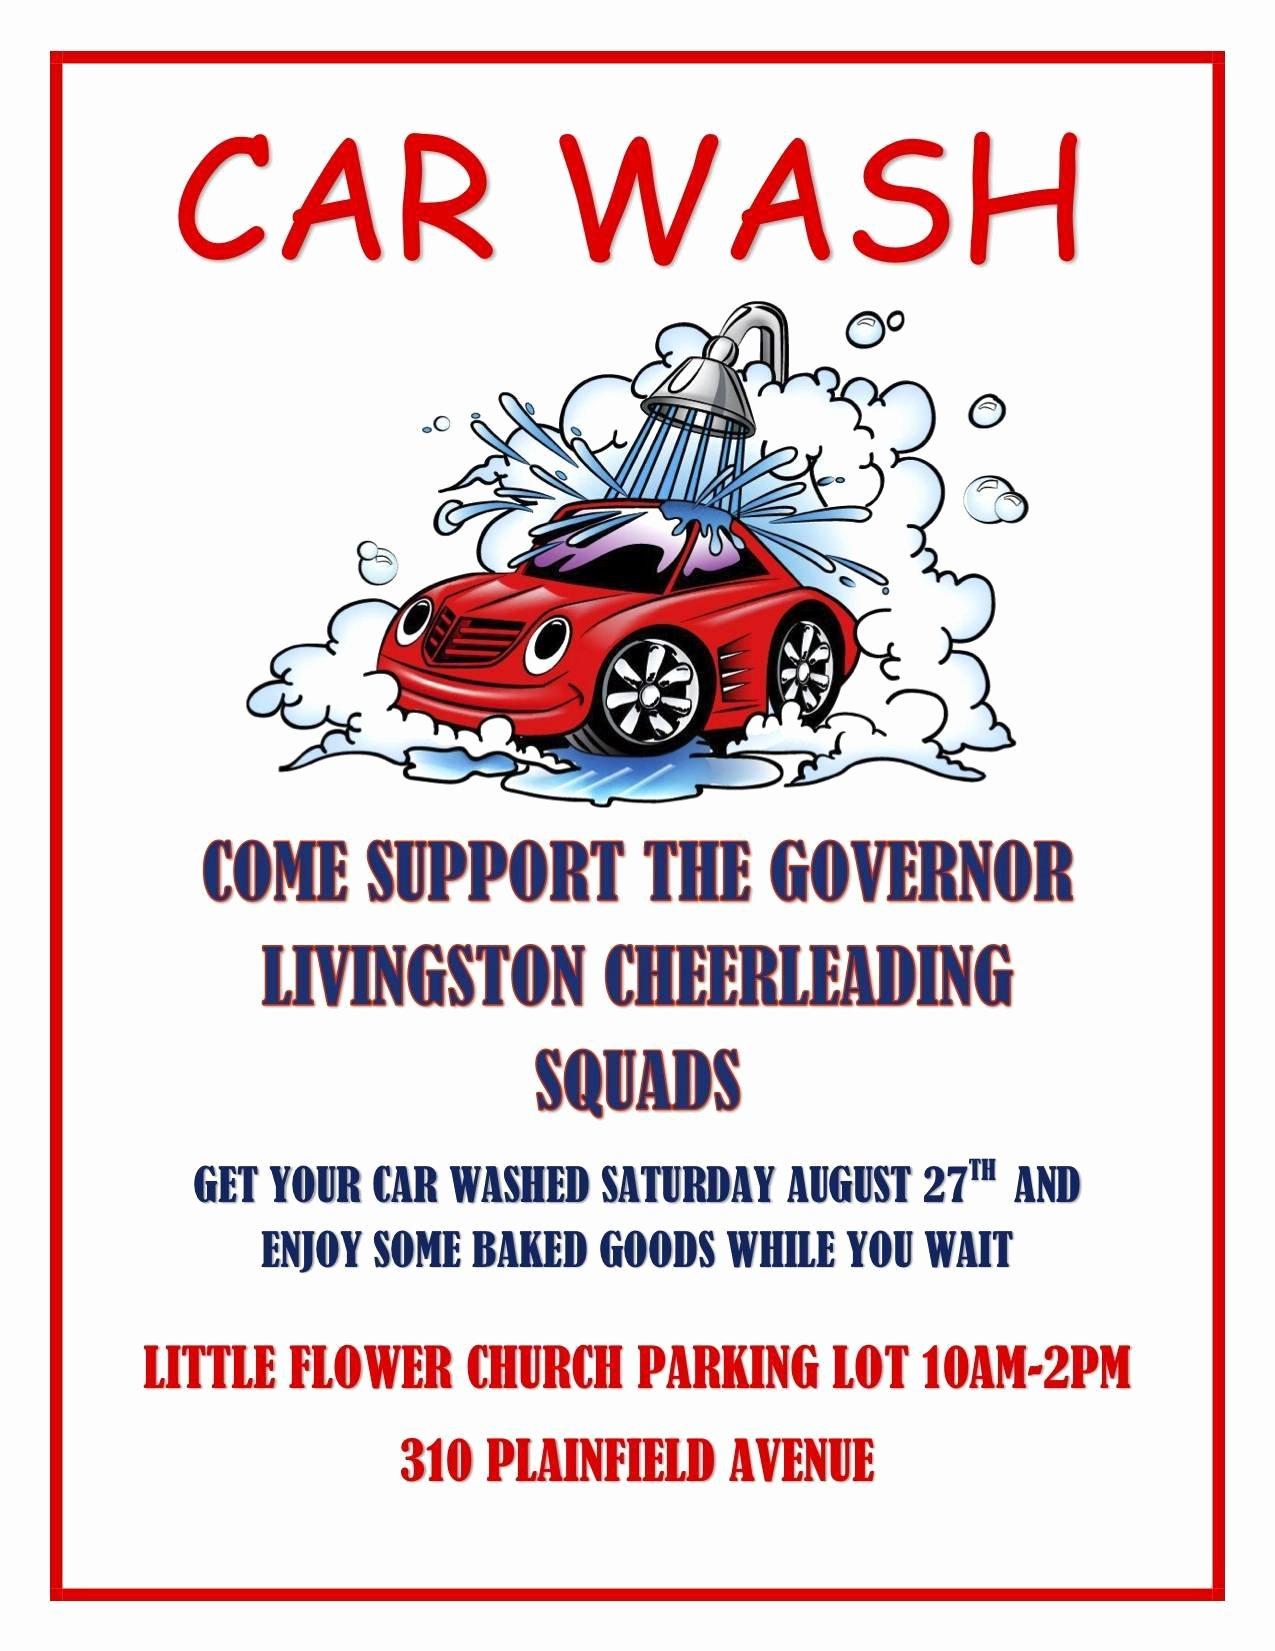 Car Wash Fundraiser Flyers Inspirational Gov Livingston Cheerleaders Hold Car Wash and Bake Sale